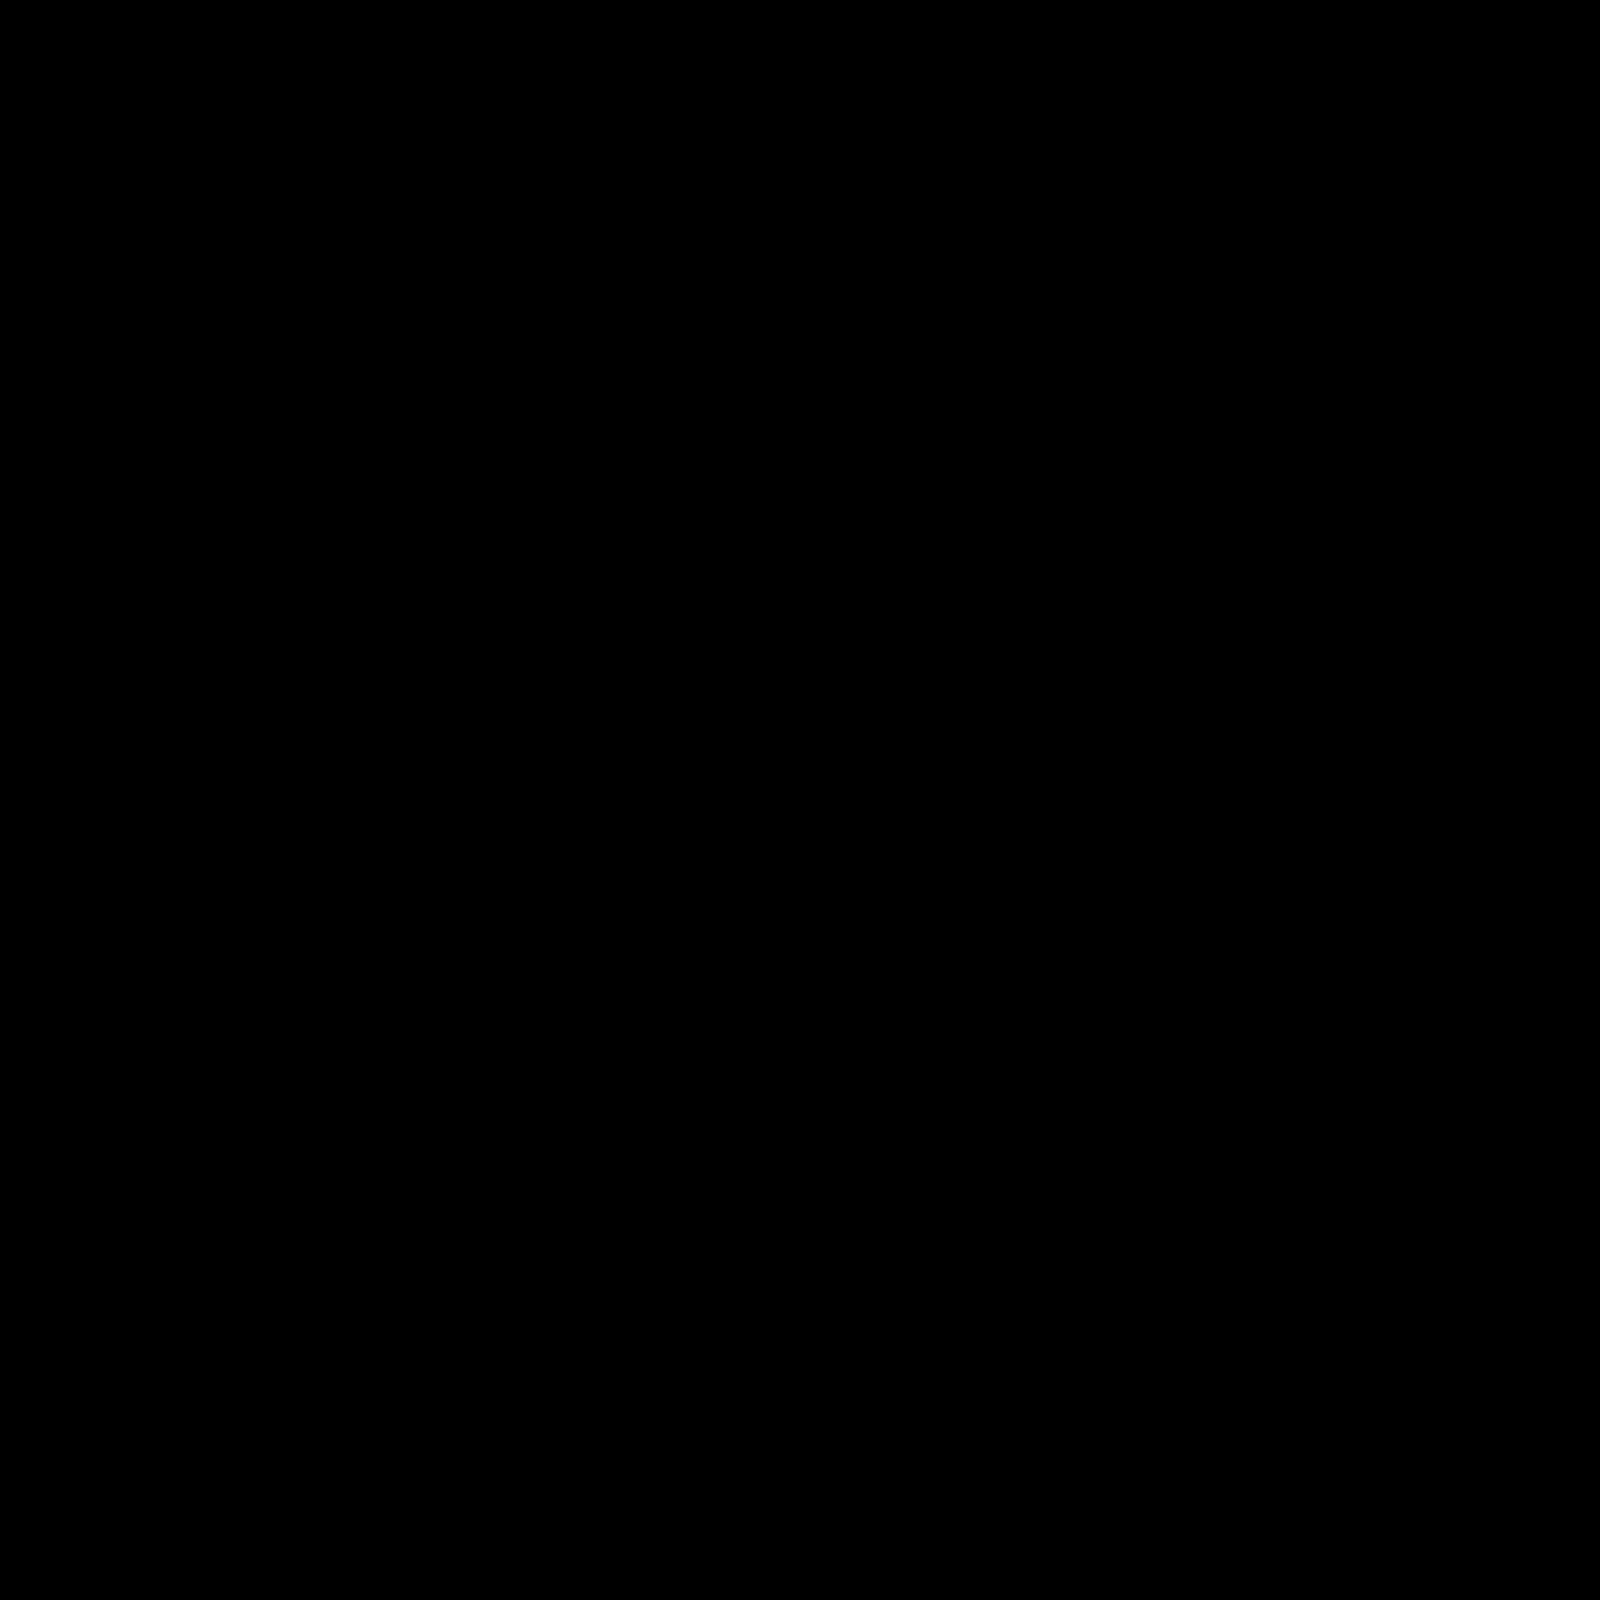 7500x7500 HD Half-life Lambda by Guardians38 on DeviantArt